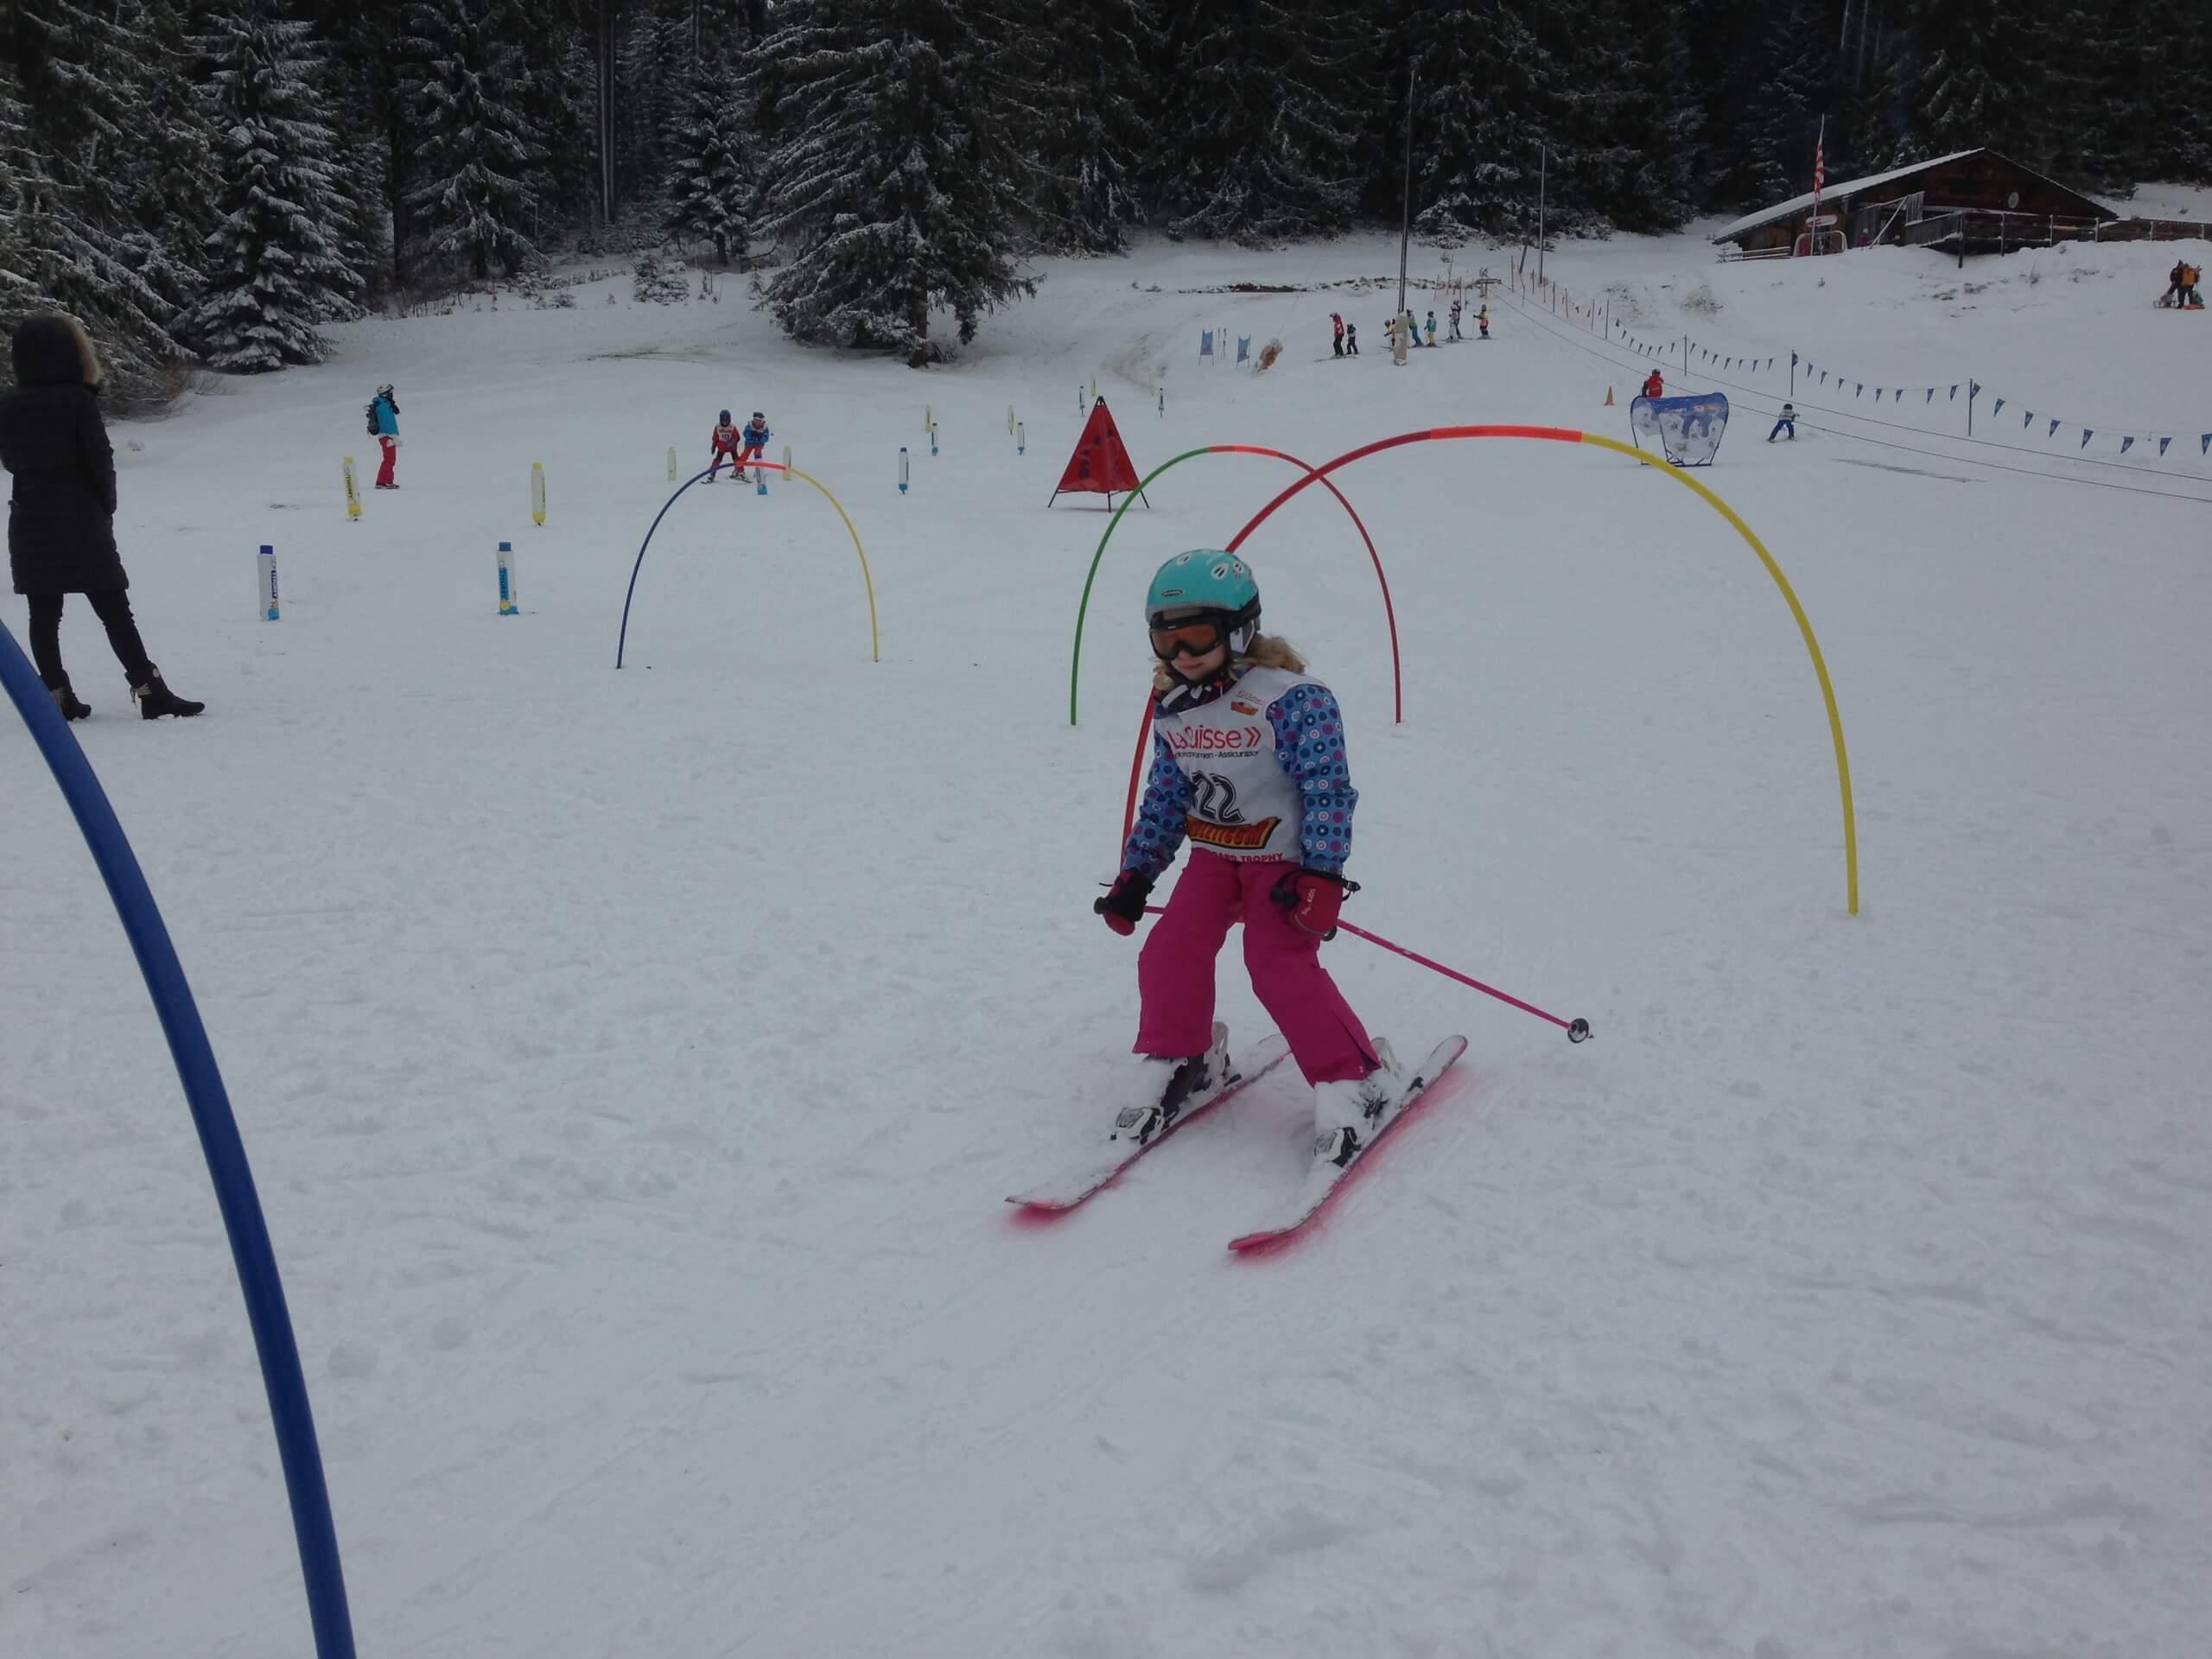 beatenberg-skischule-bogen-fahren-winter-kind